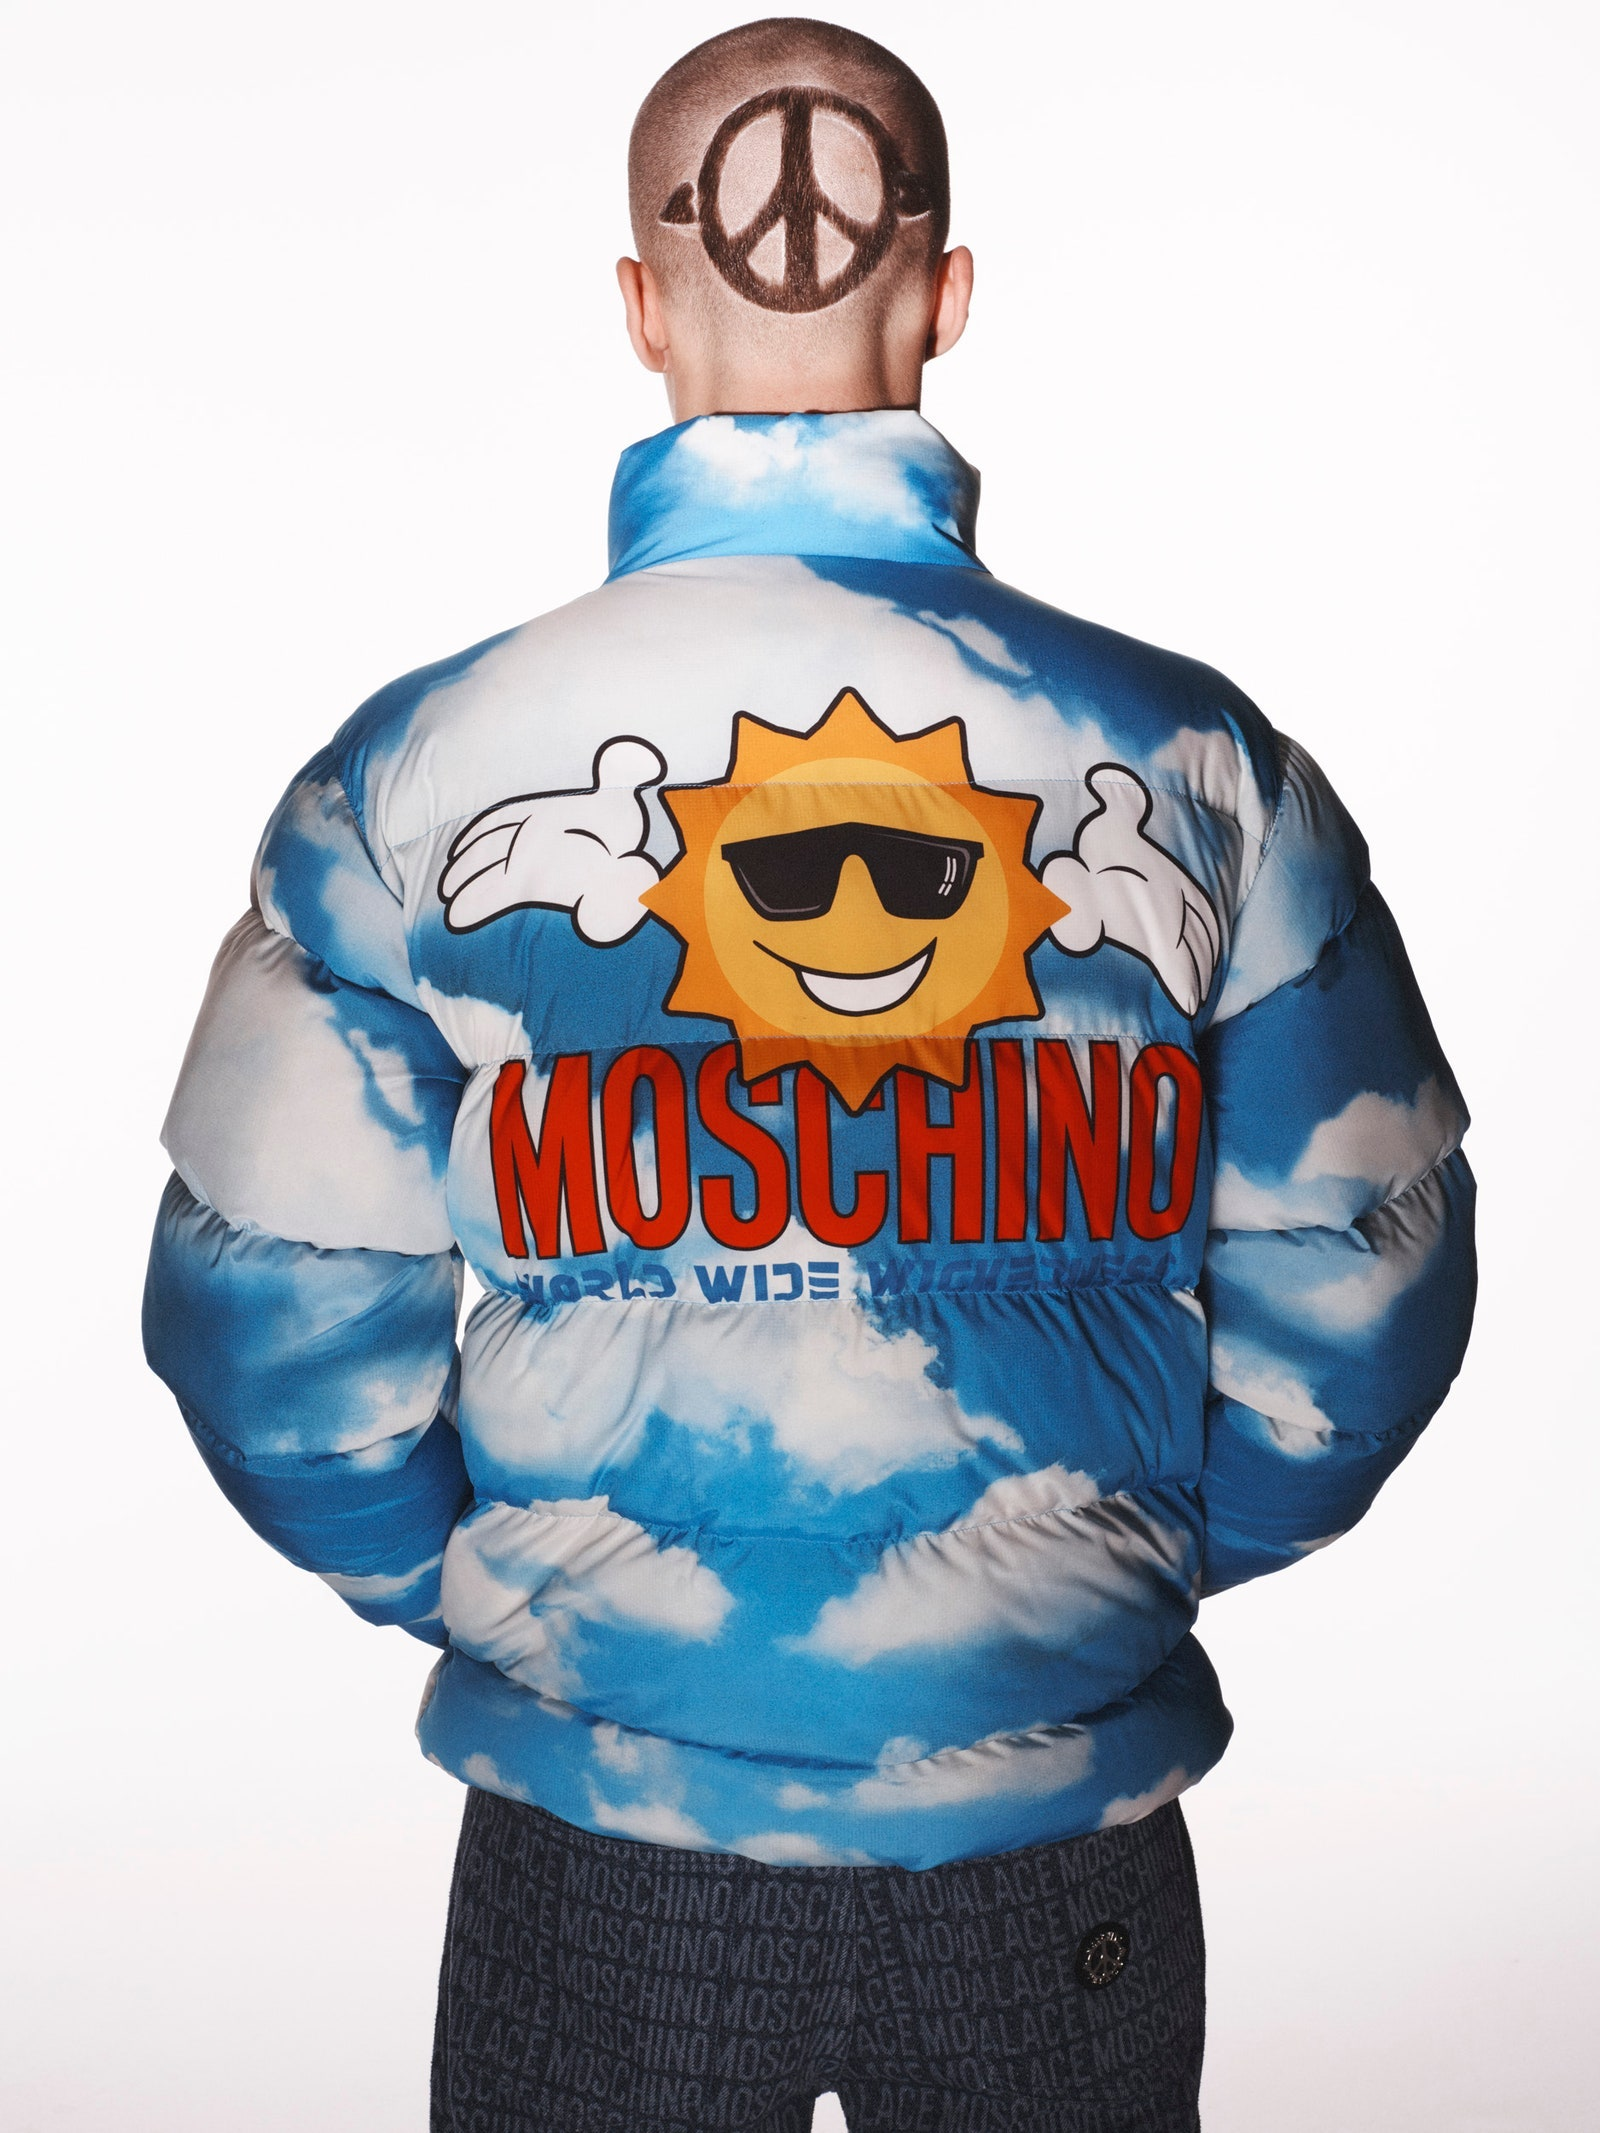 Palace сделали коллаборацию с Moschino